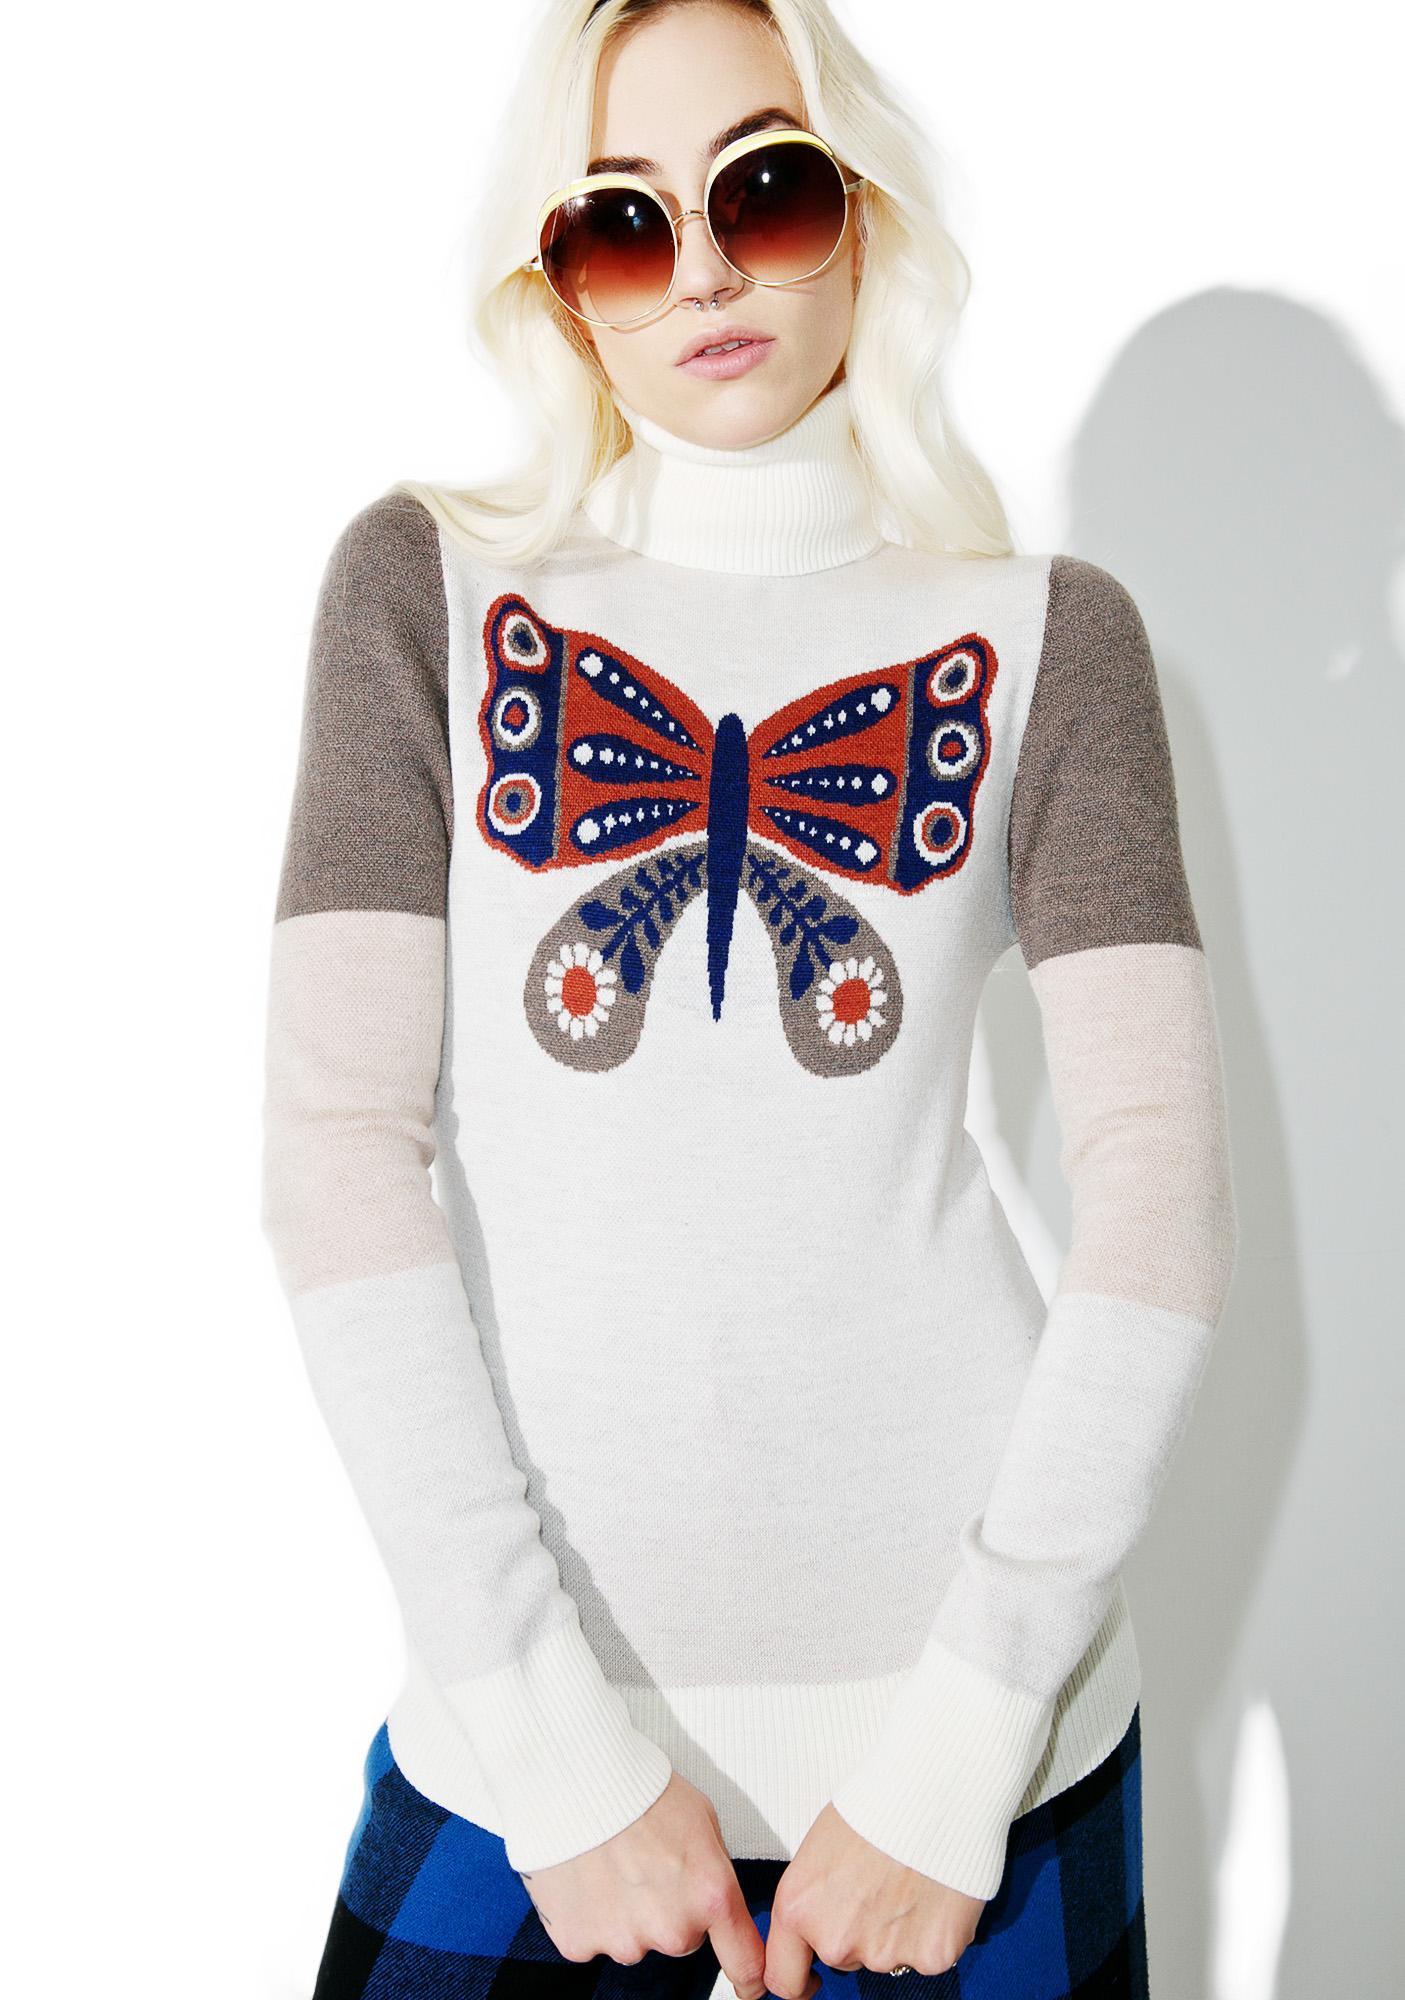 Sugarhigh + Lovestoned Mariposa Turtleneck